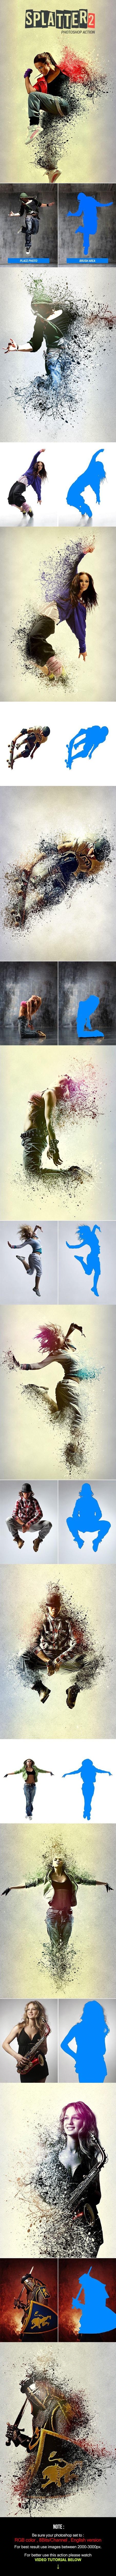 Splatter 2 - Photoshop Action #photoeffect Download here: http://graphicriver.net/item/splatter-2-photoshop-action/15713159?ref=ksioks